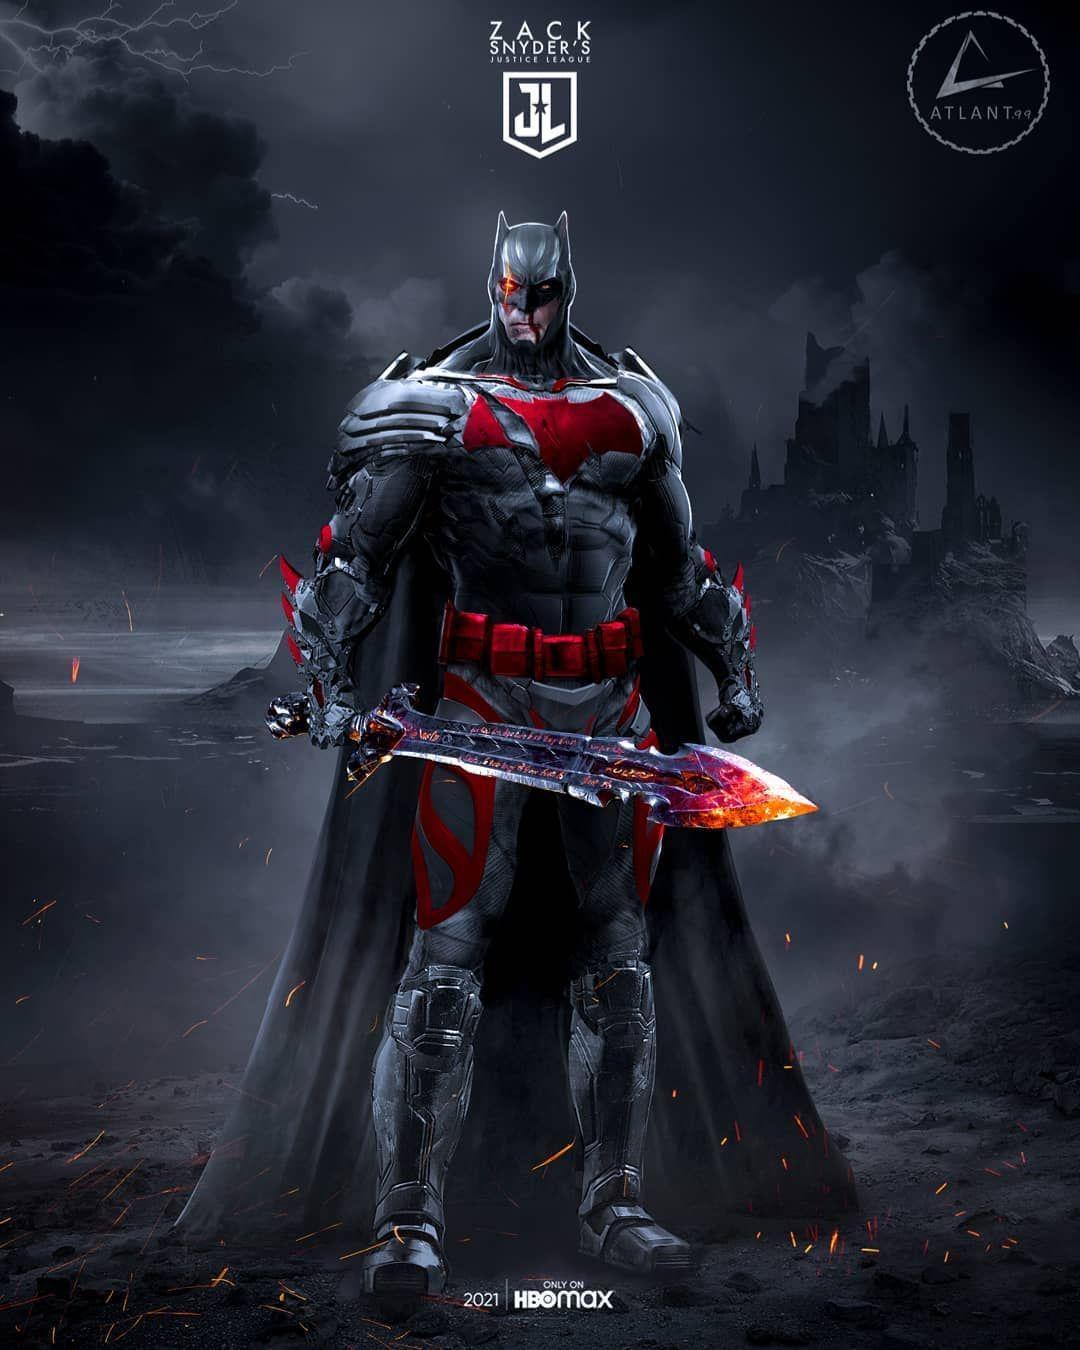 1 163 Likes 13 Comments A T L A N T Atlant 99 On Instagram The Dark Knight 3 4 Zack Snyder S Justice League Hboma In 2020 Batman Concept Batman Comics Batman